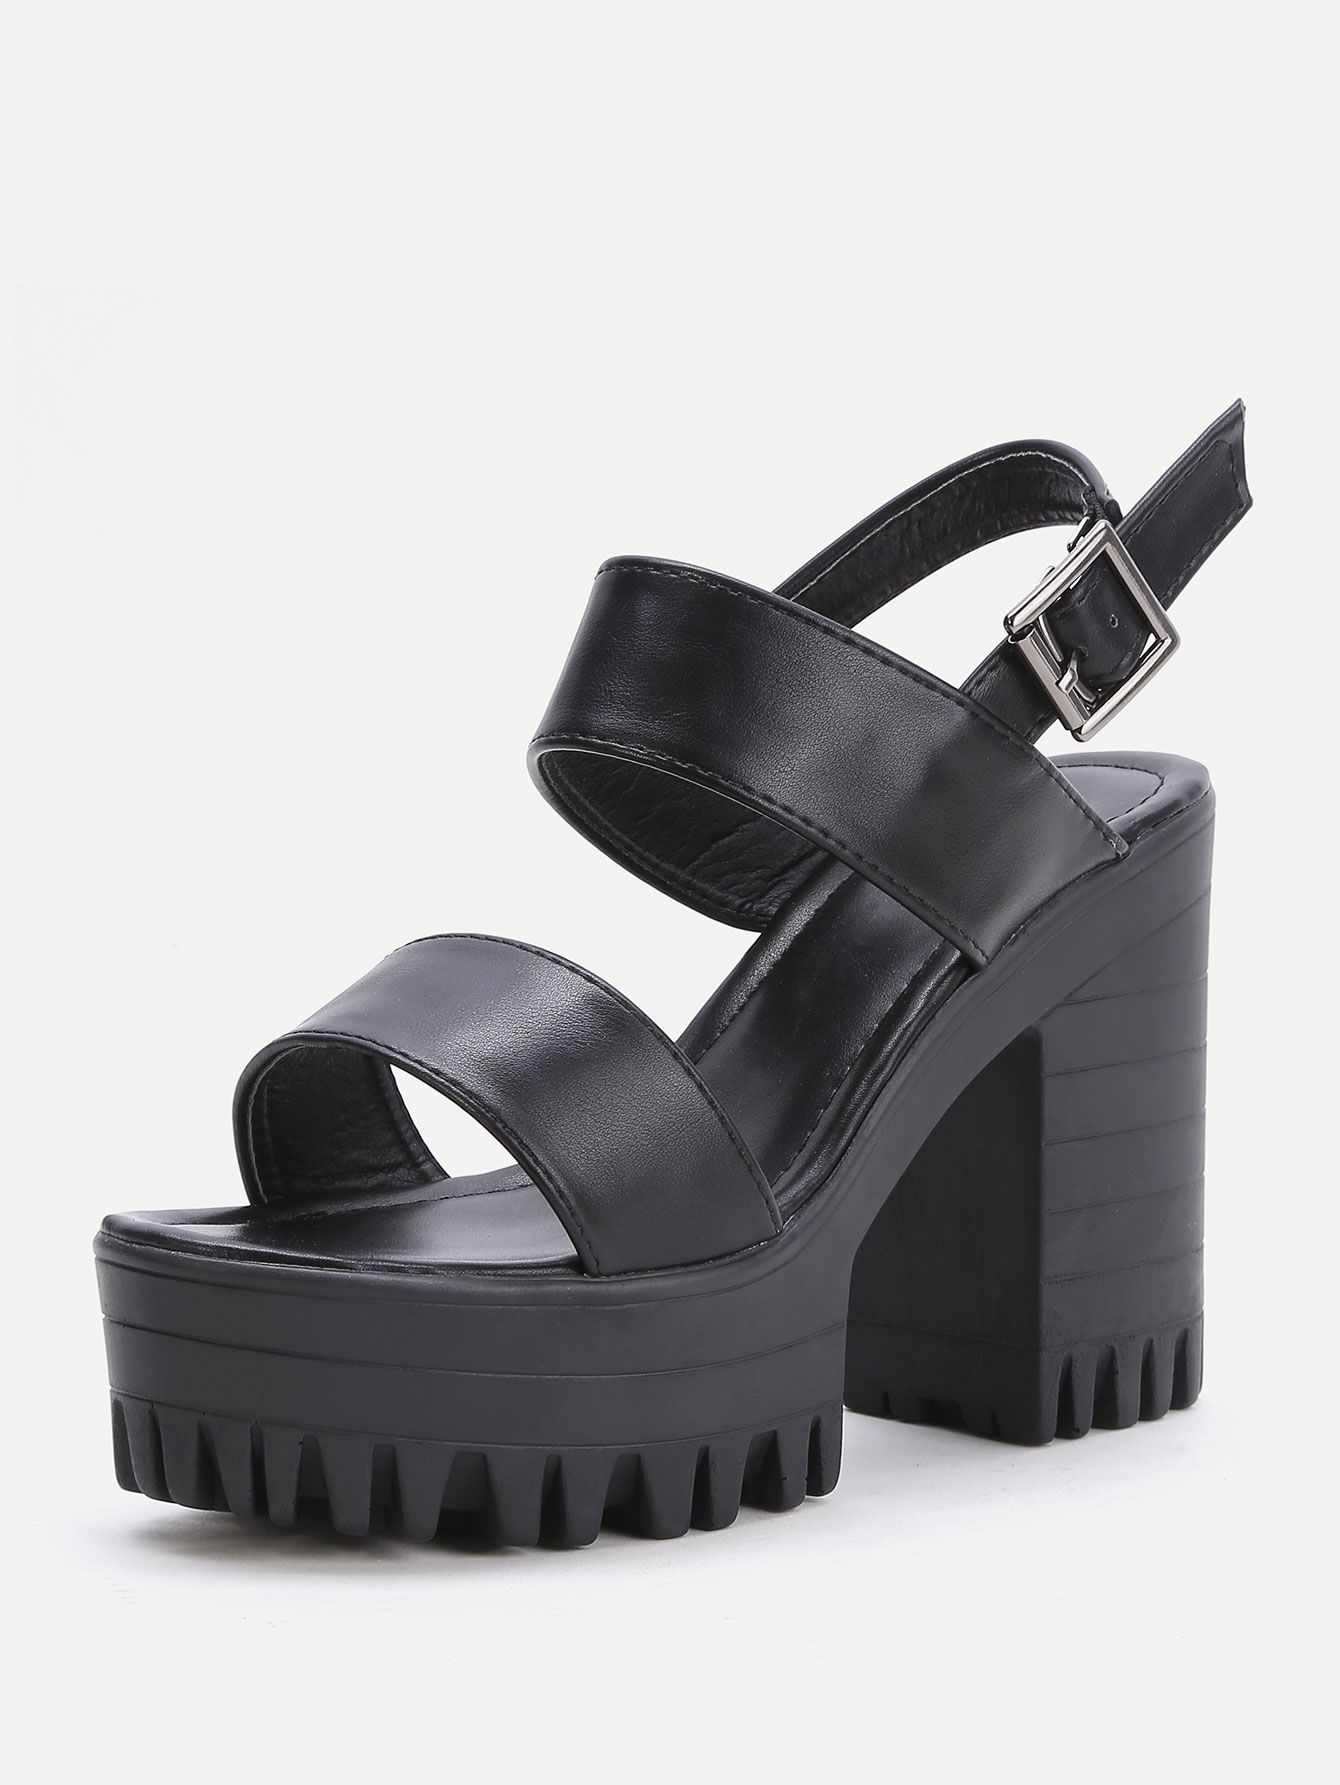 0d03dd7da4f shoes170321812 2 Chunky Heel Platform Sandals